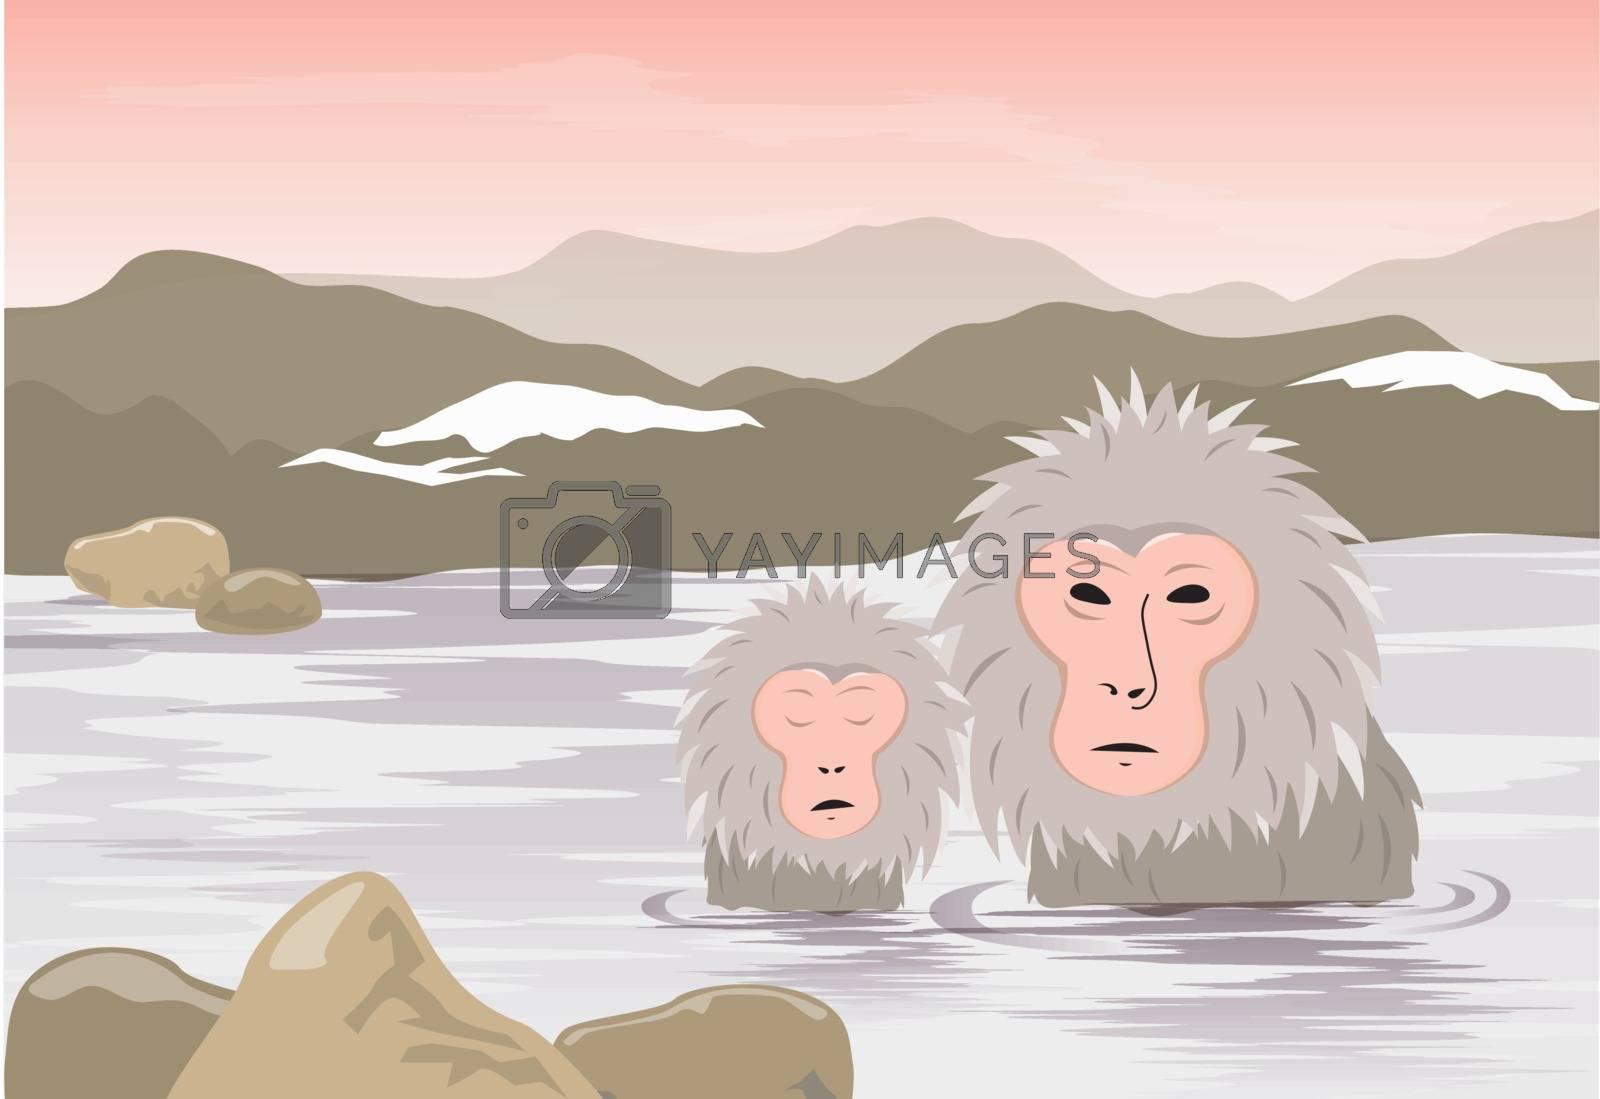 Snow Monkeys, Japanese Macaques bathe in onsen hot springs of Nagano, Japan Vector.